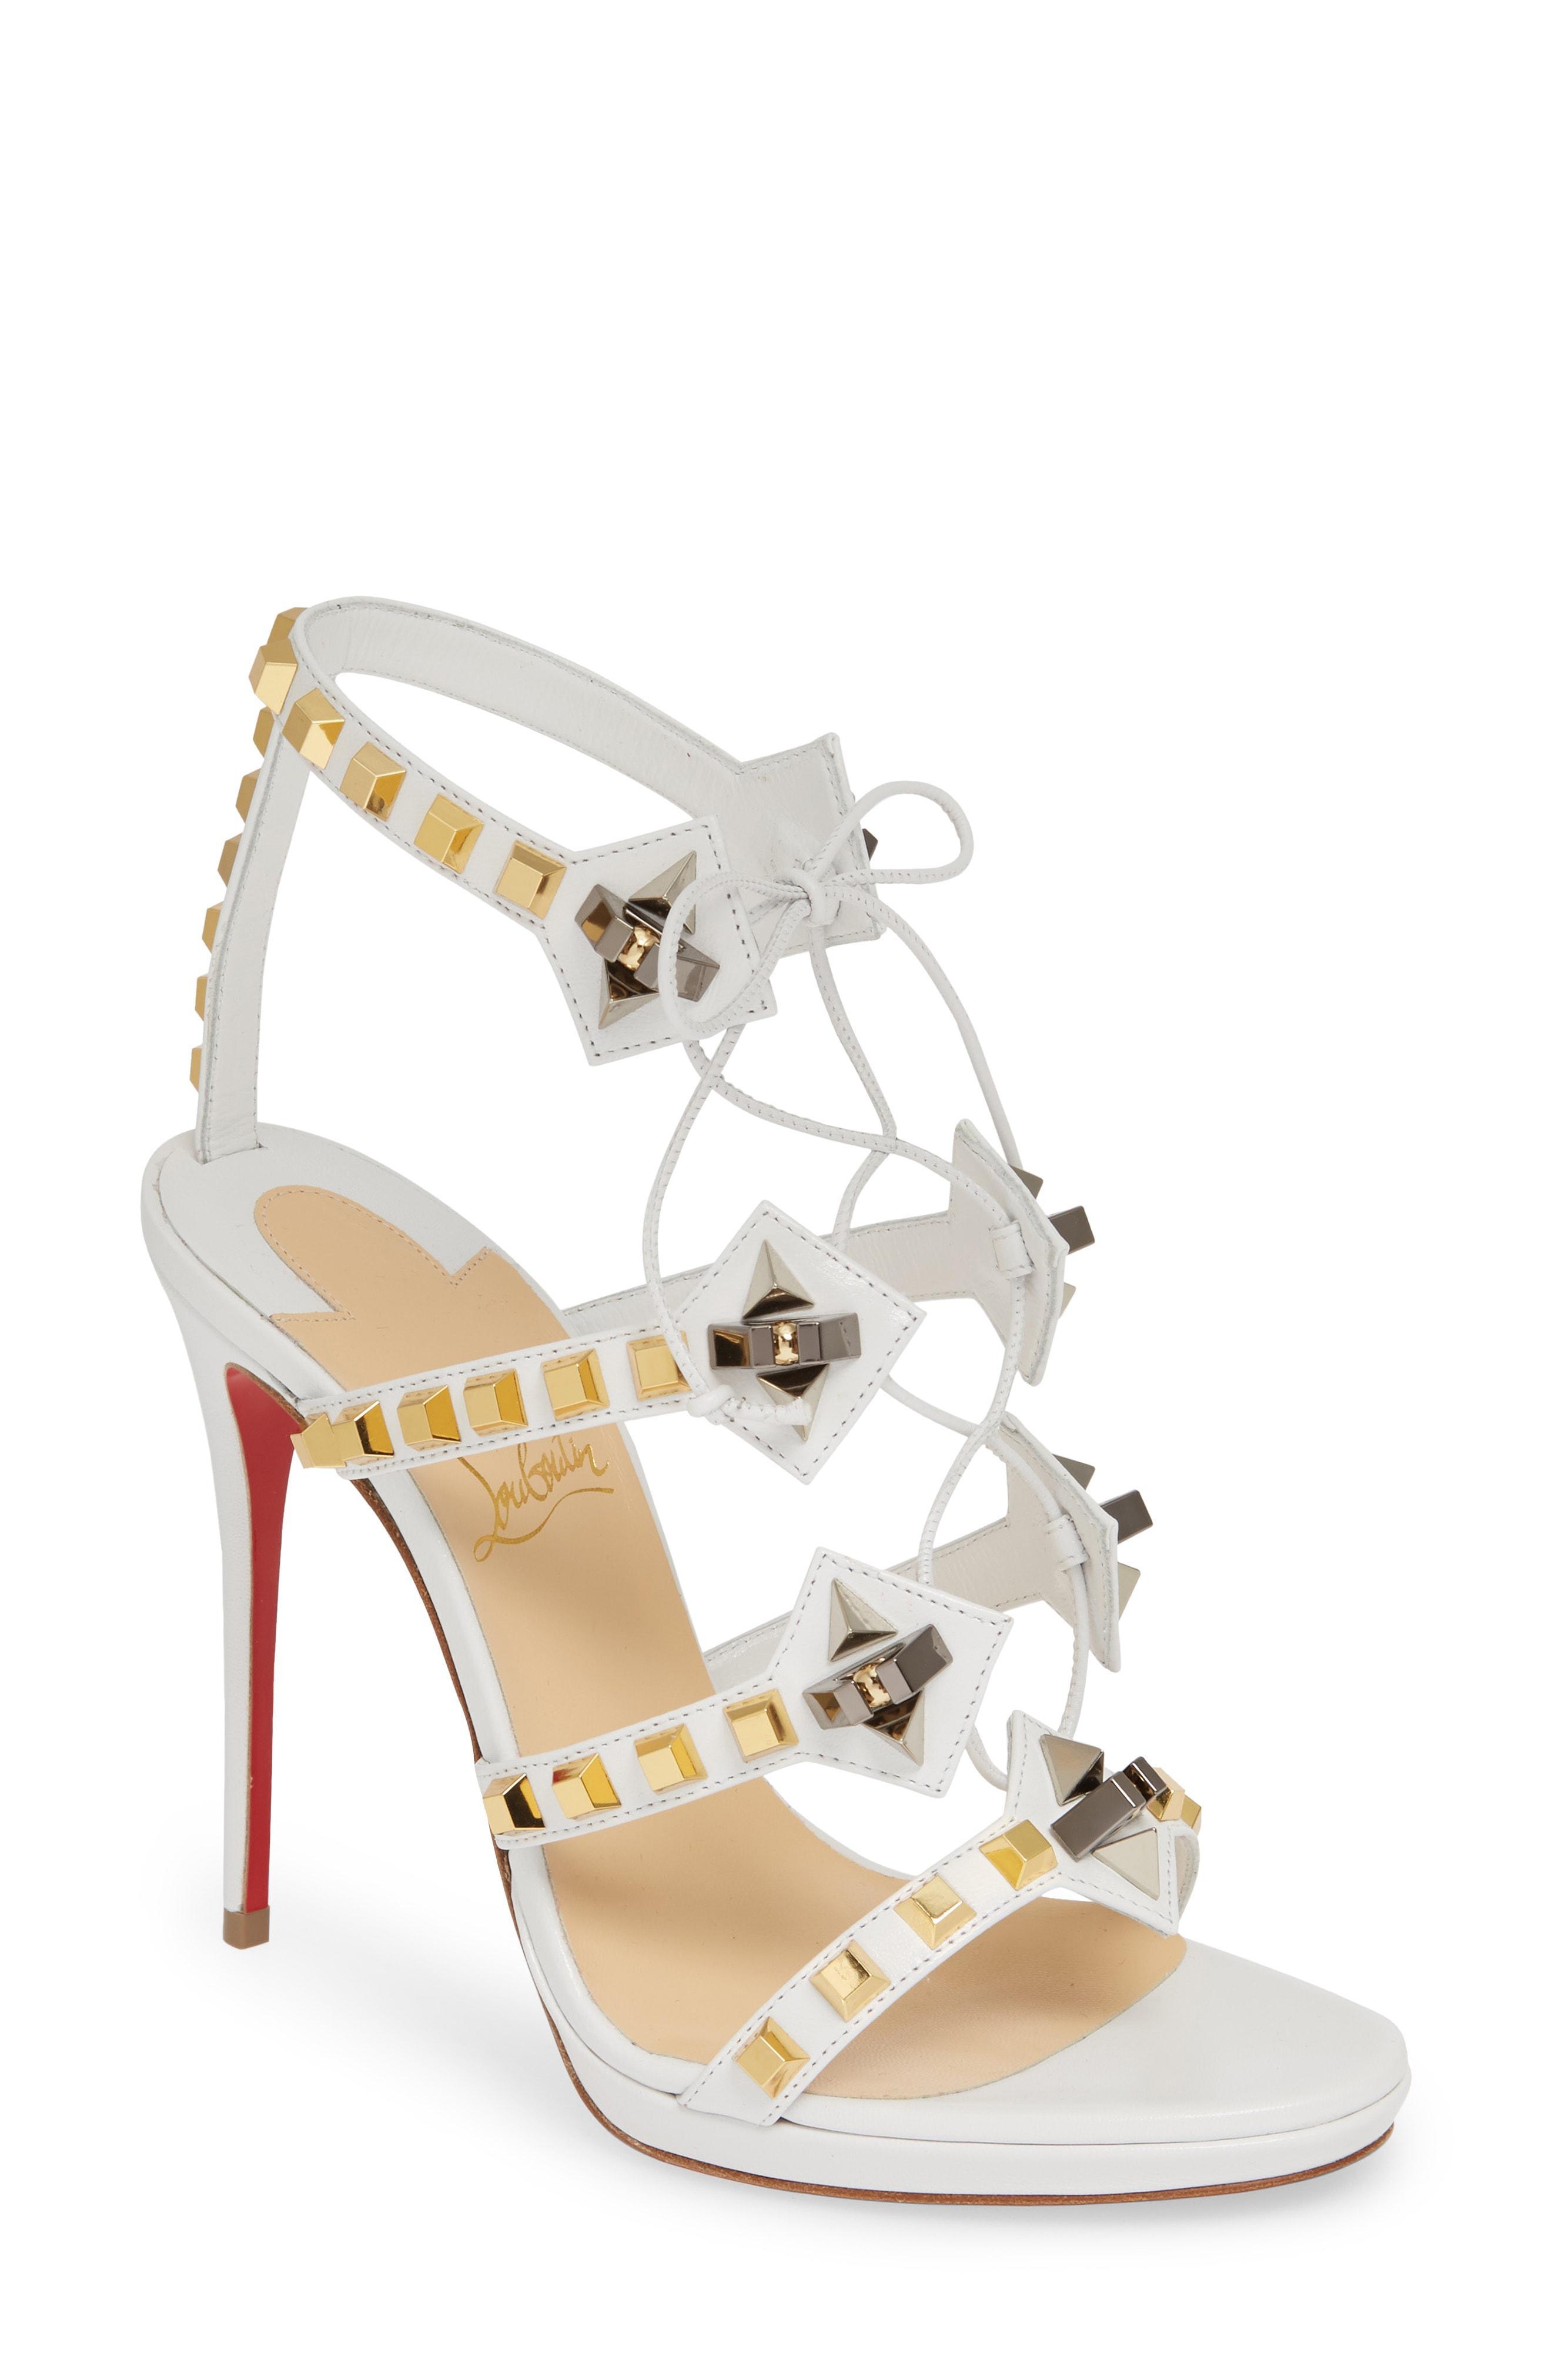 a9d2f4caf80 Christian Louboutin. Women s Metallic Multiplaticool Studded Gladiator  Sandal